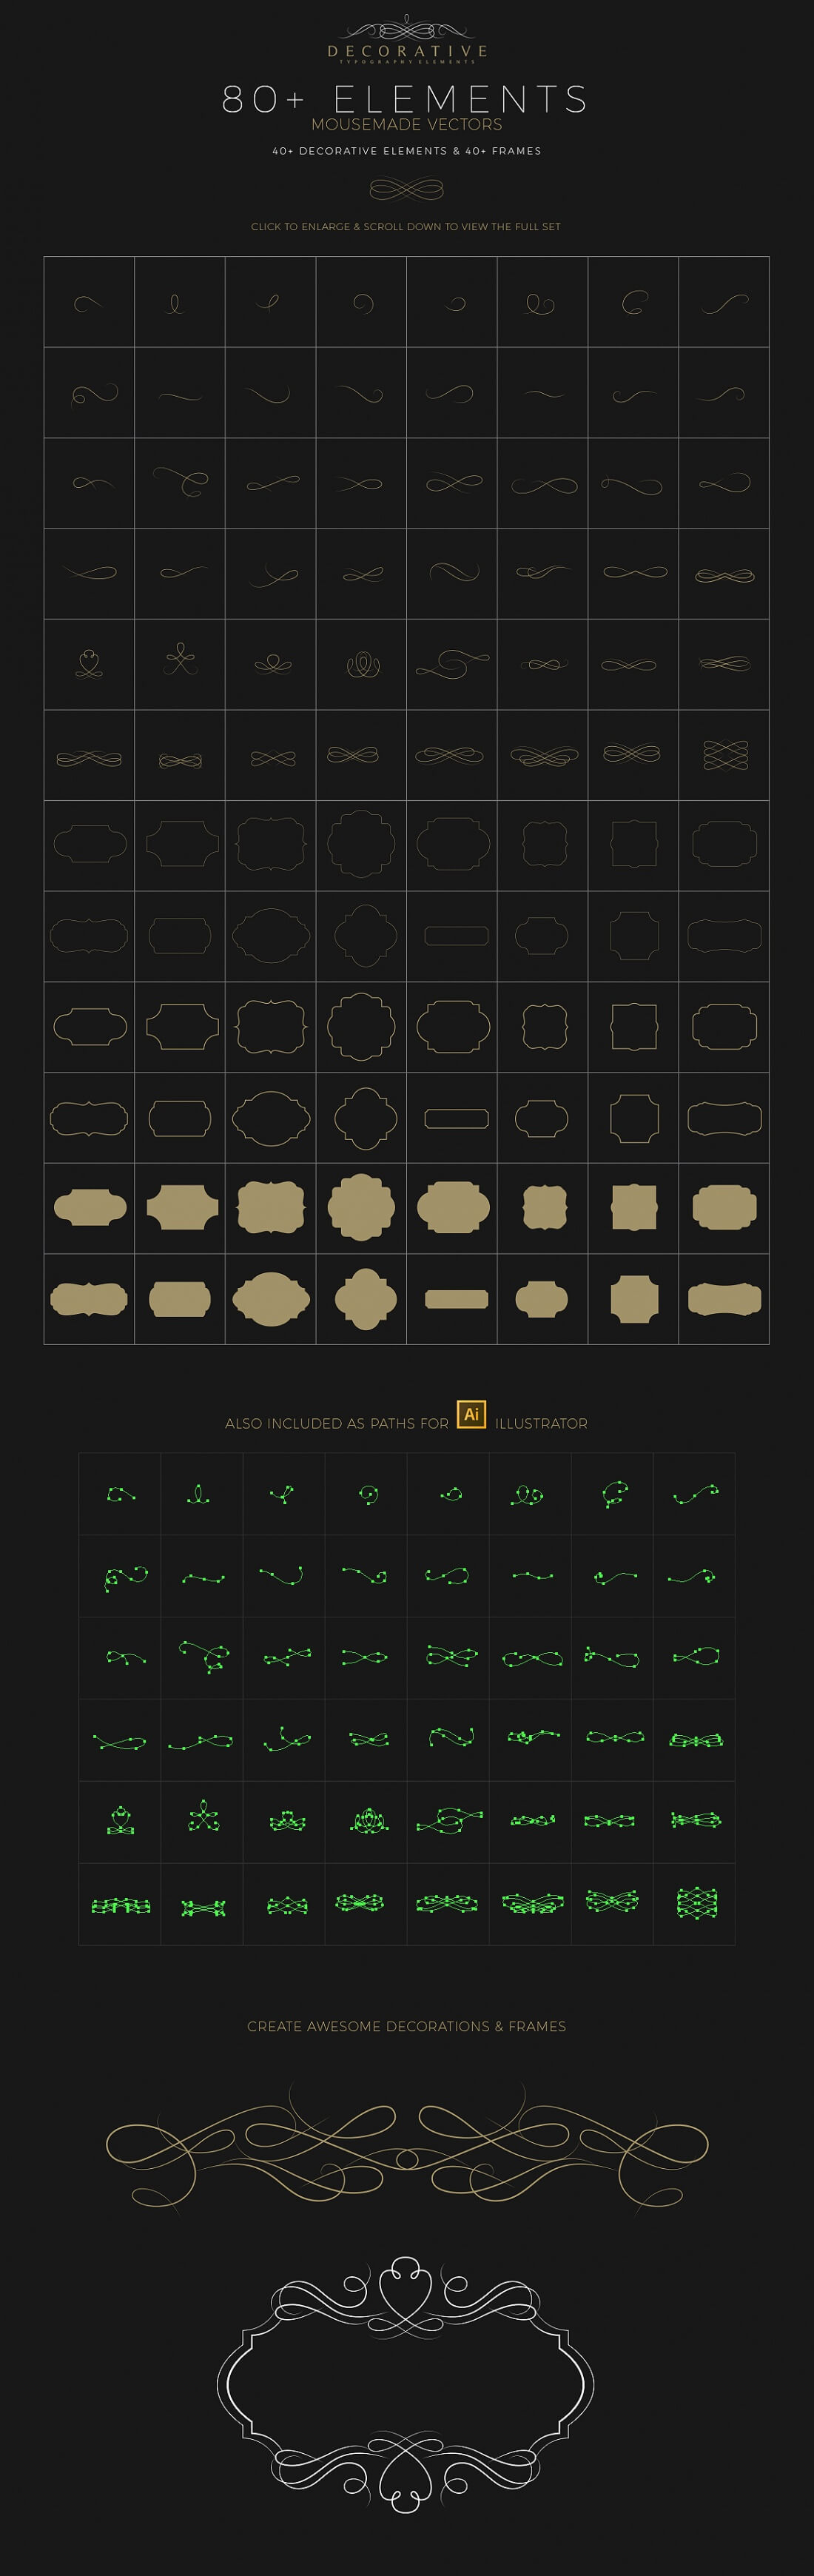 Professional logo creation kit bundle with elements